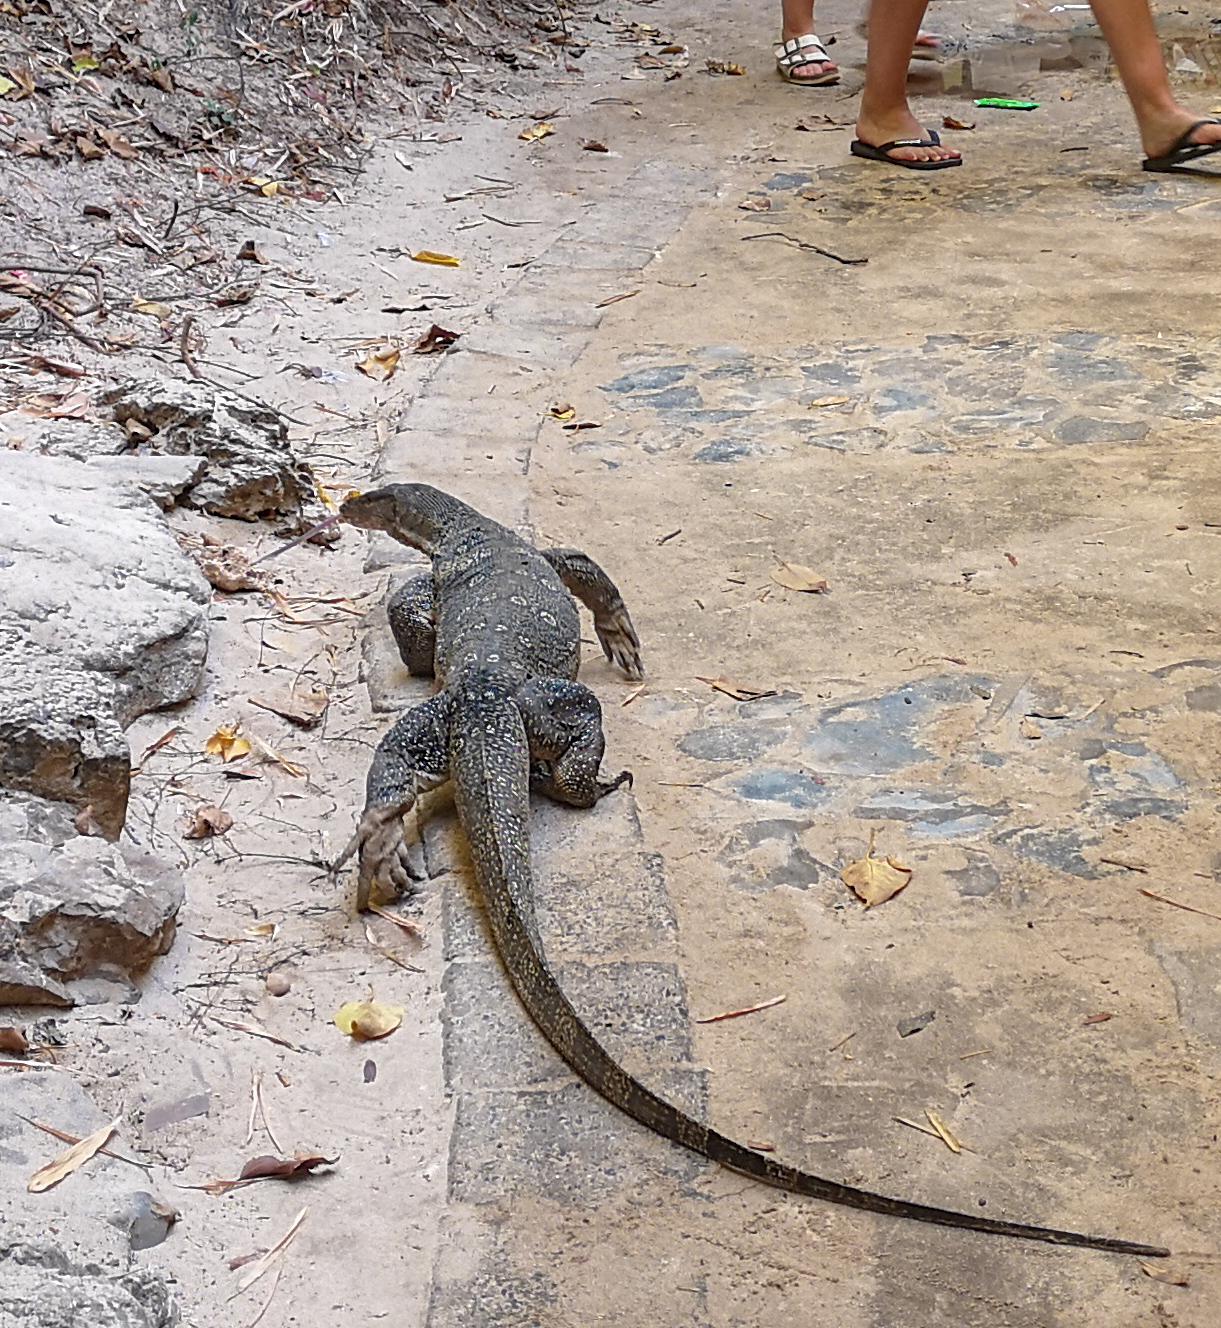 thailand lizard